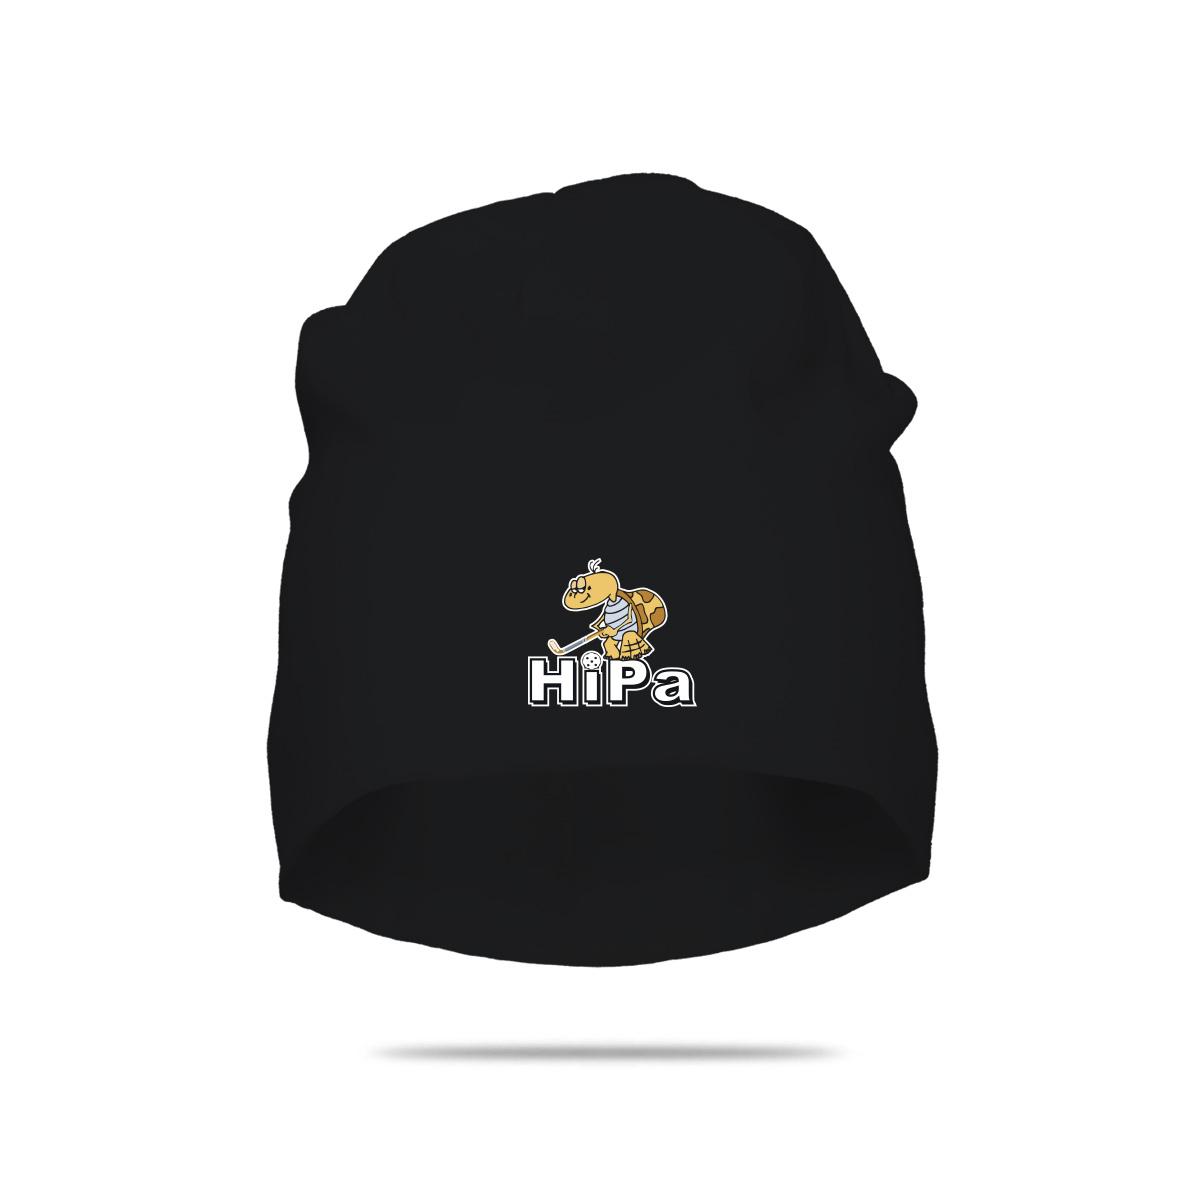 Teamprint-Pujo-HiPa-Musta